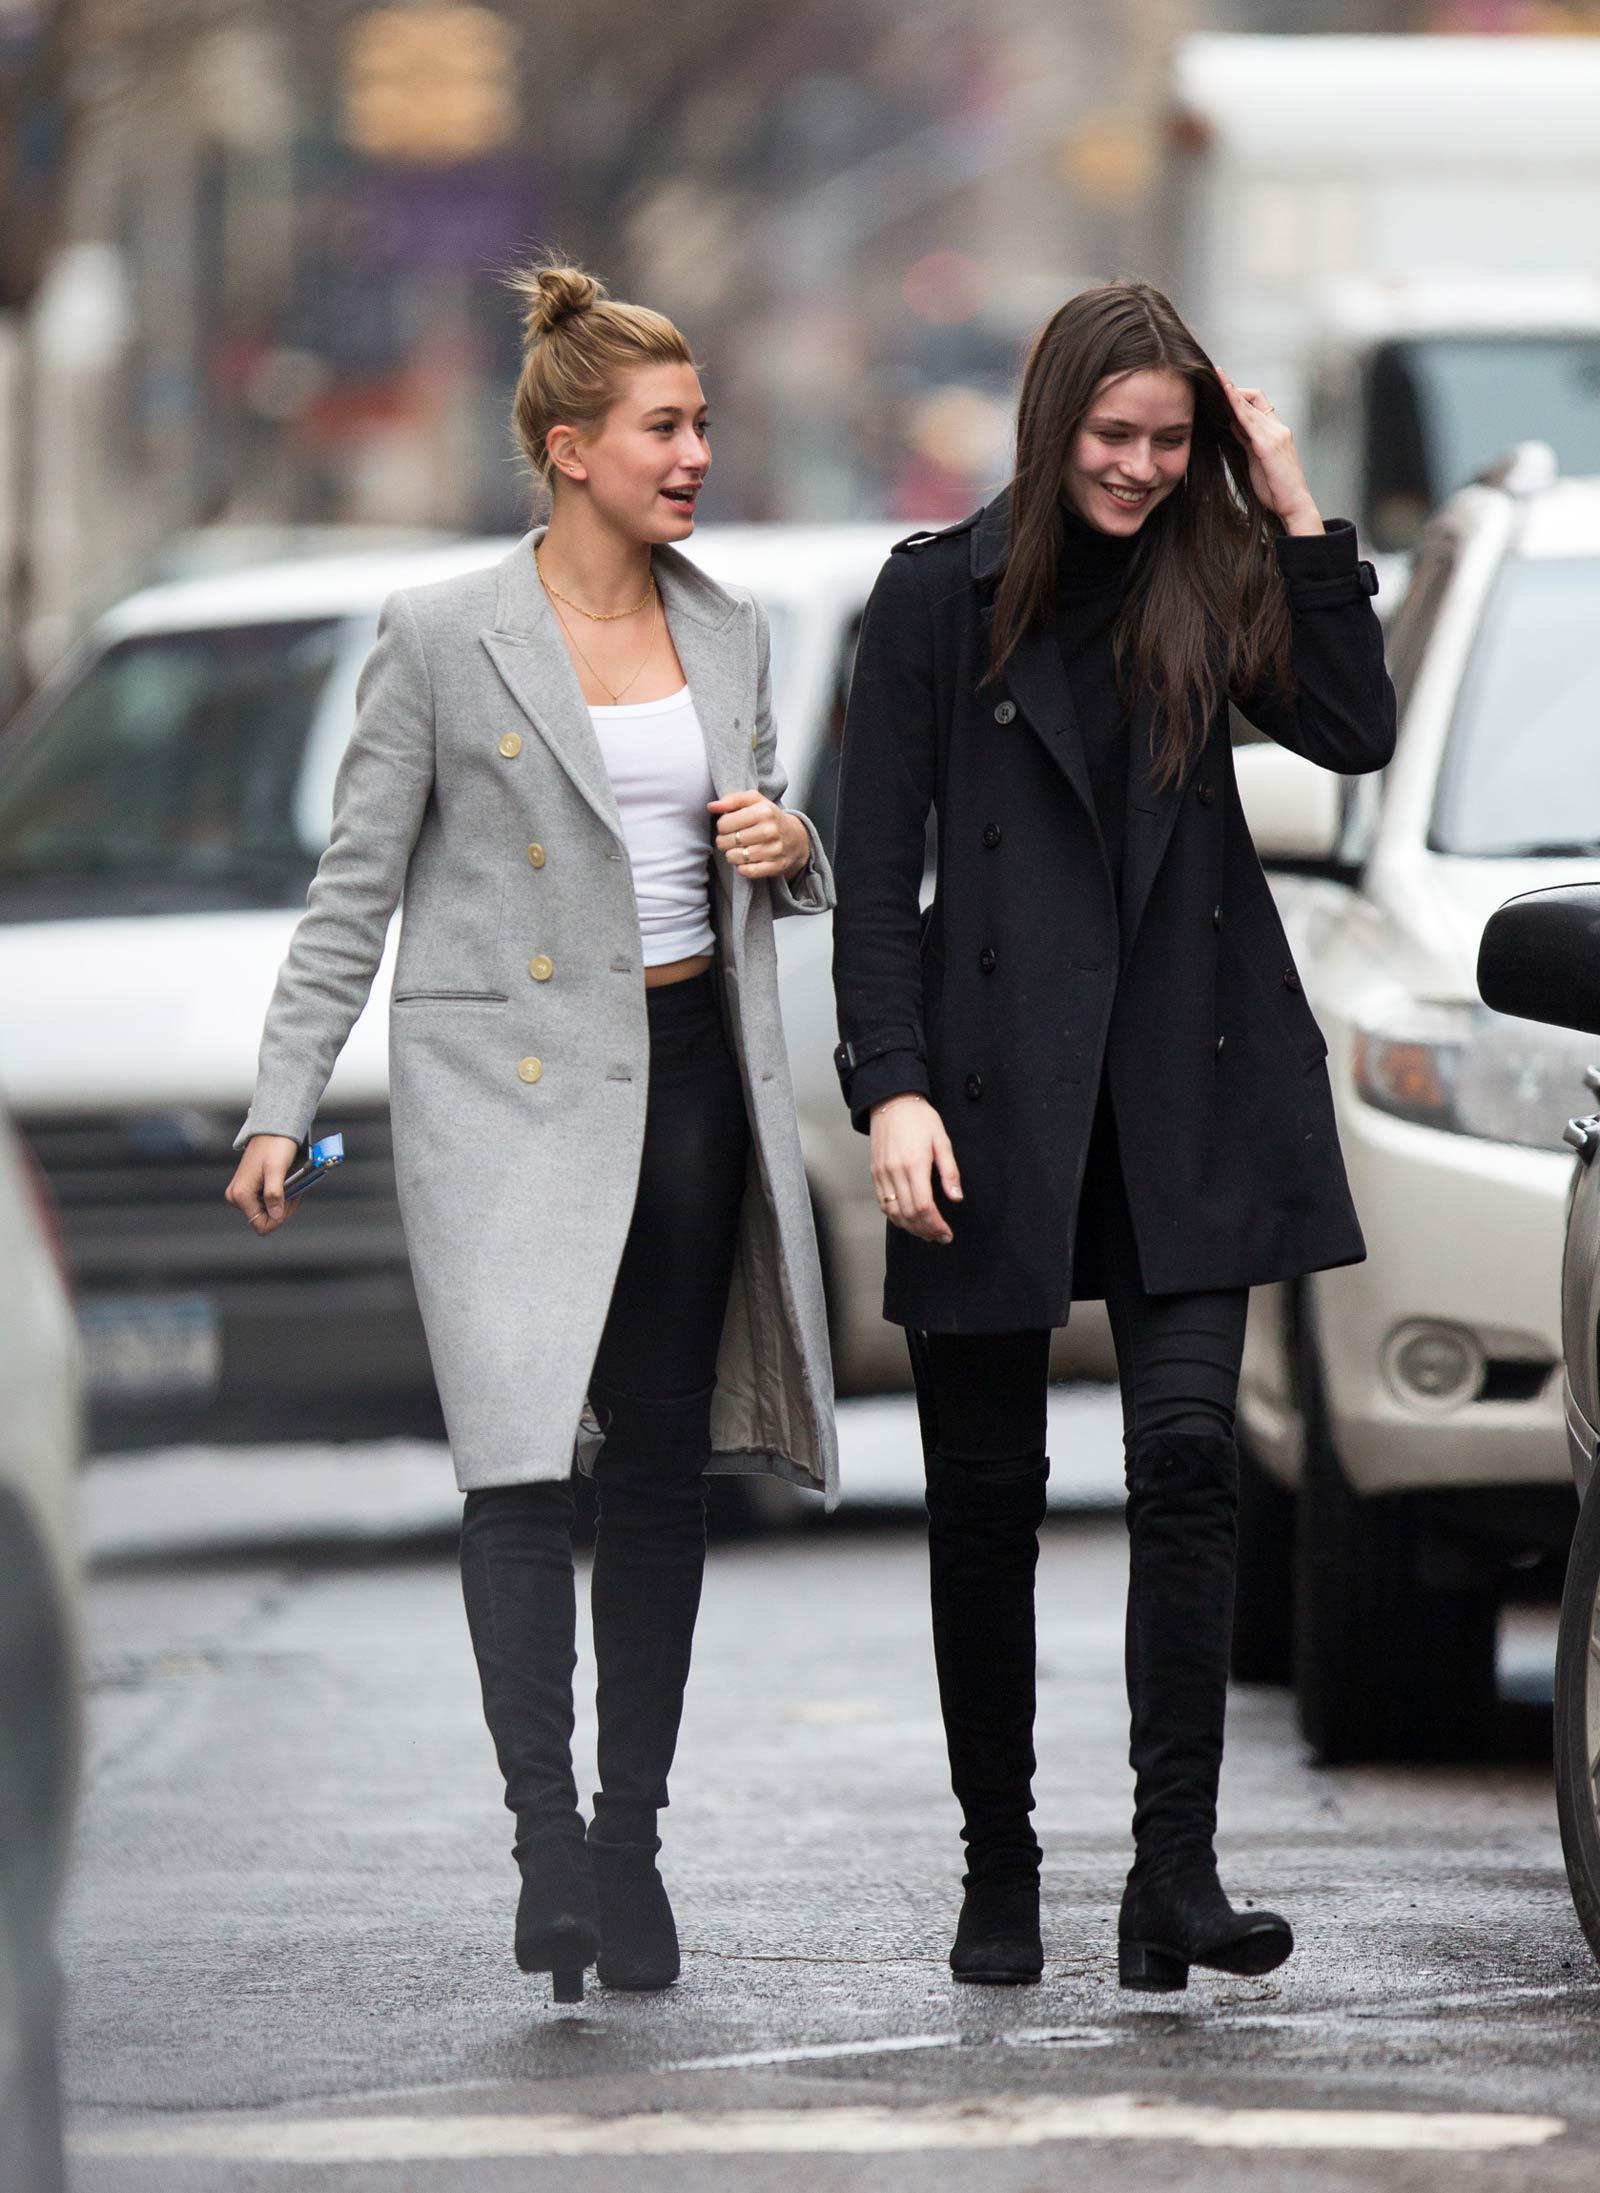 Hailey Baldwin out shopping in New York